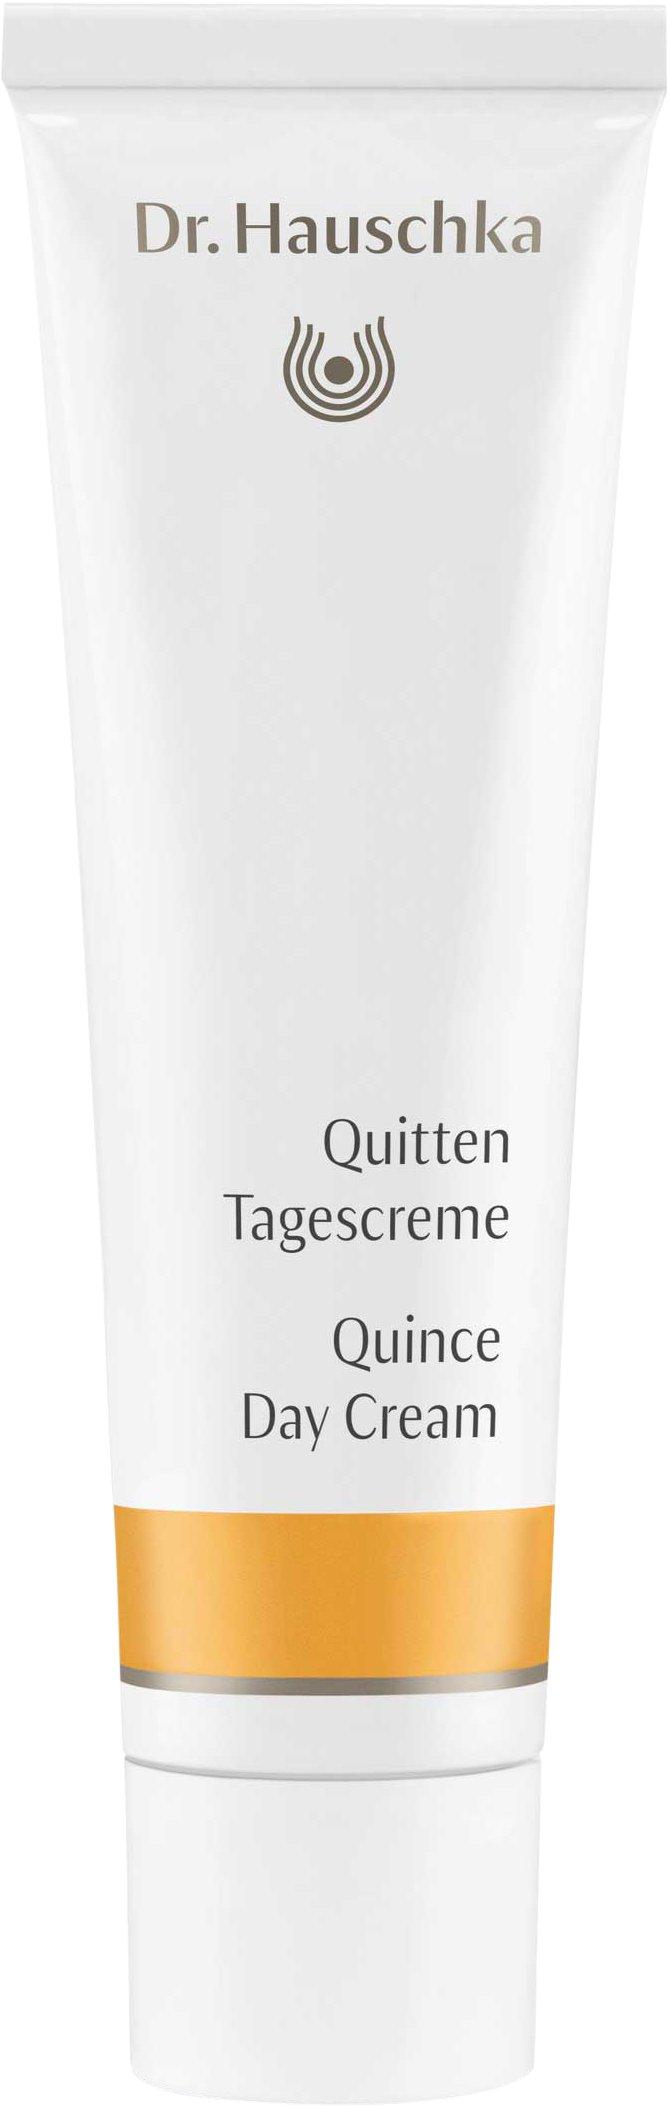 Dr. Hauschka - Quince Dagcreme 30 ml